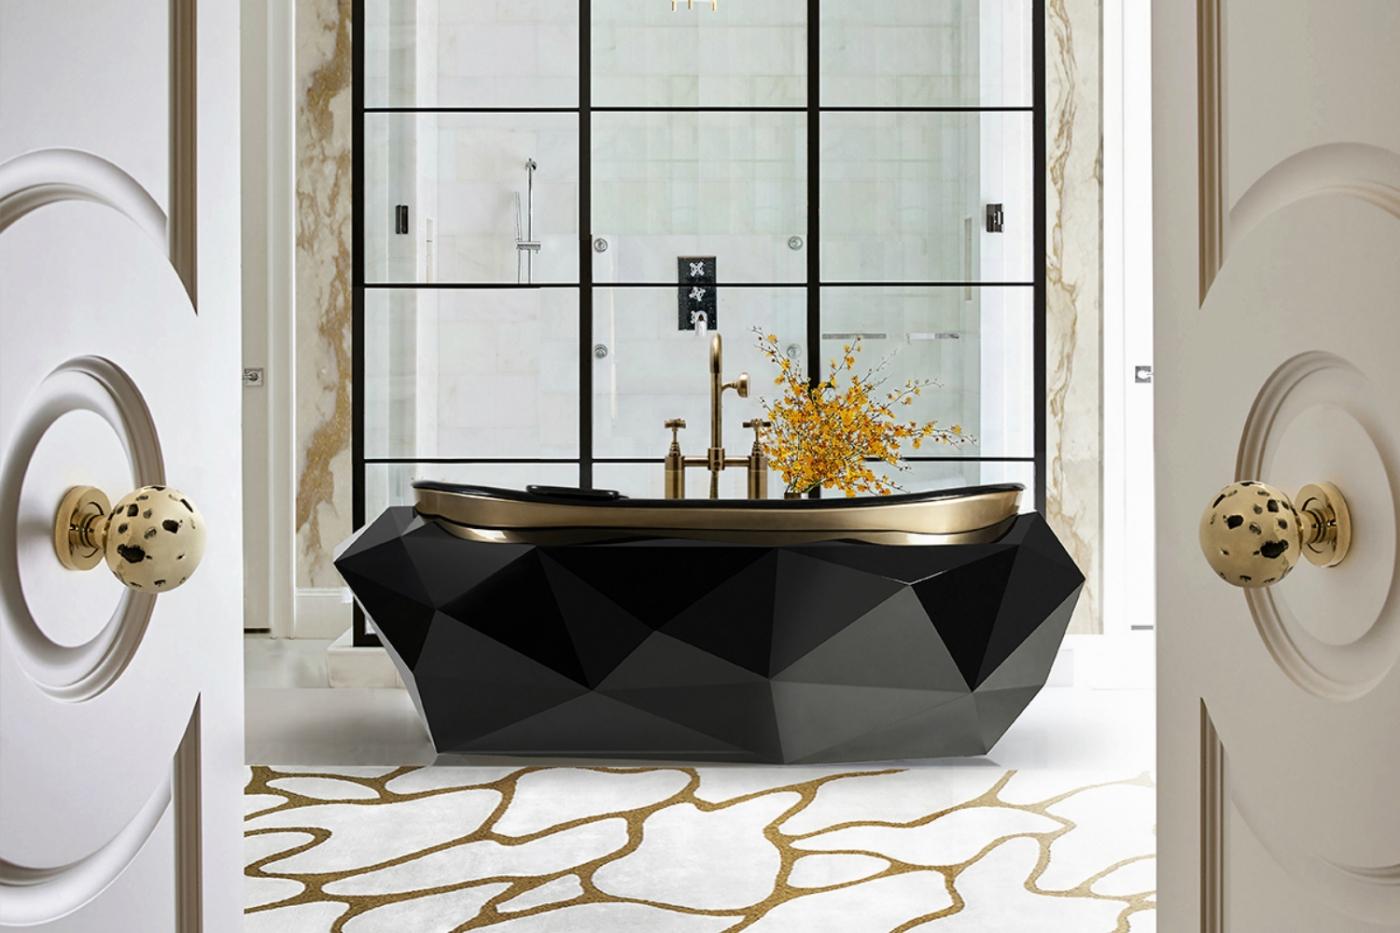 modern bathrooms Bold and Modern Bathrooms That You Will Fall In Love With Bold and Modern Bathrooms That You Will Fall In Love With feature 1400x933